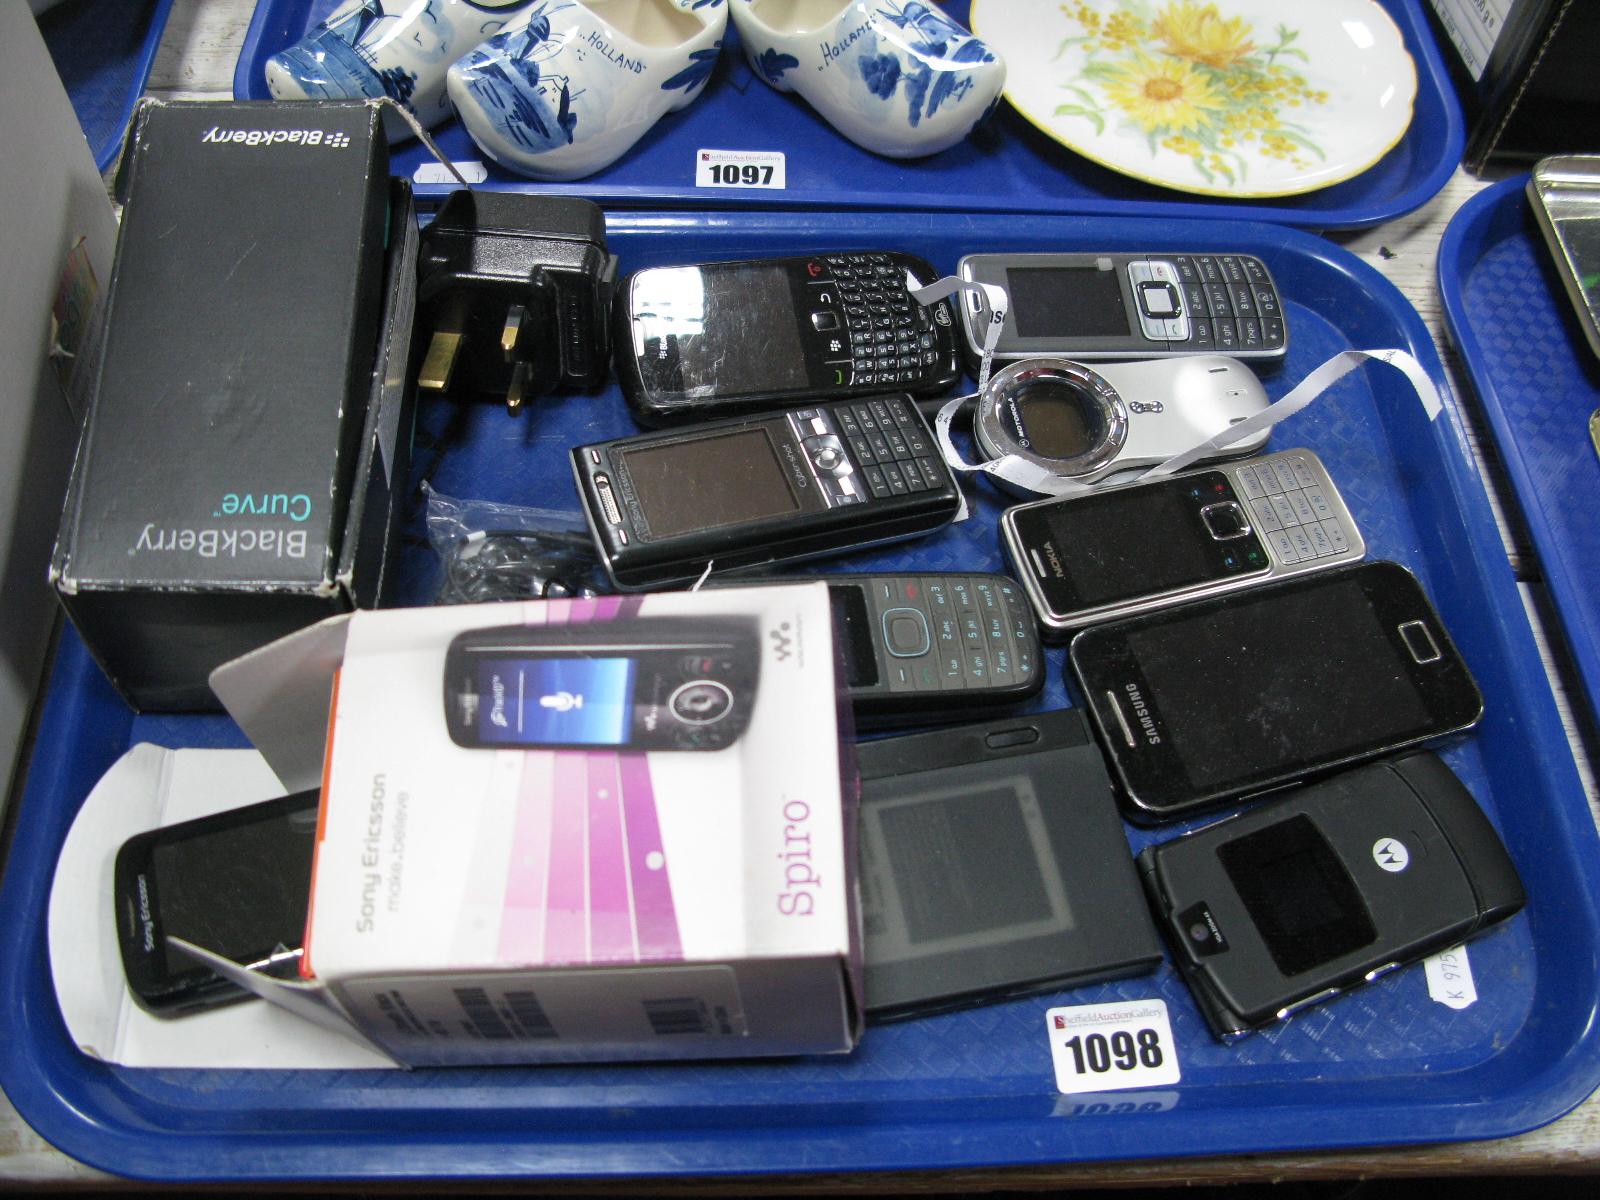 Lot 1098 - Various Mobile Phones, Blackberry, Nokia 3109, Sony Eriksson, Samsung, Motorola, Eriksson Spiro,